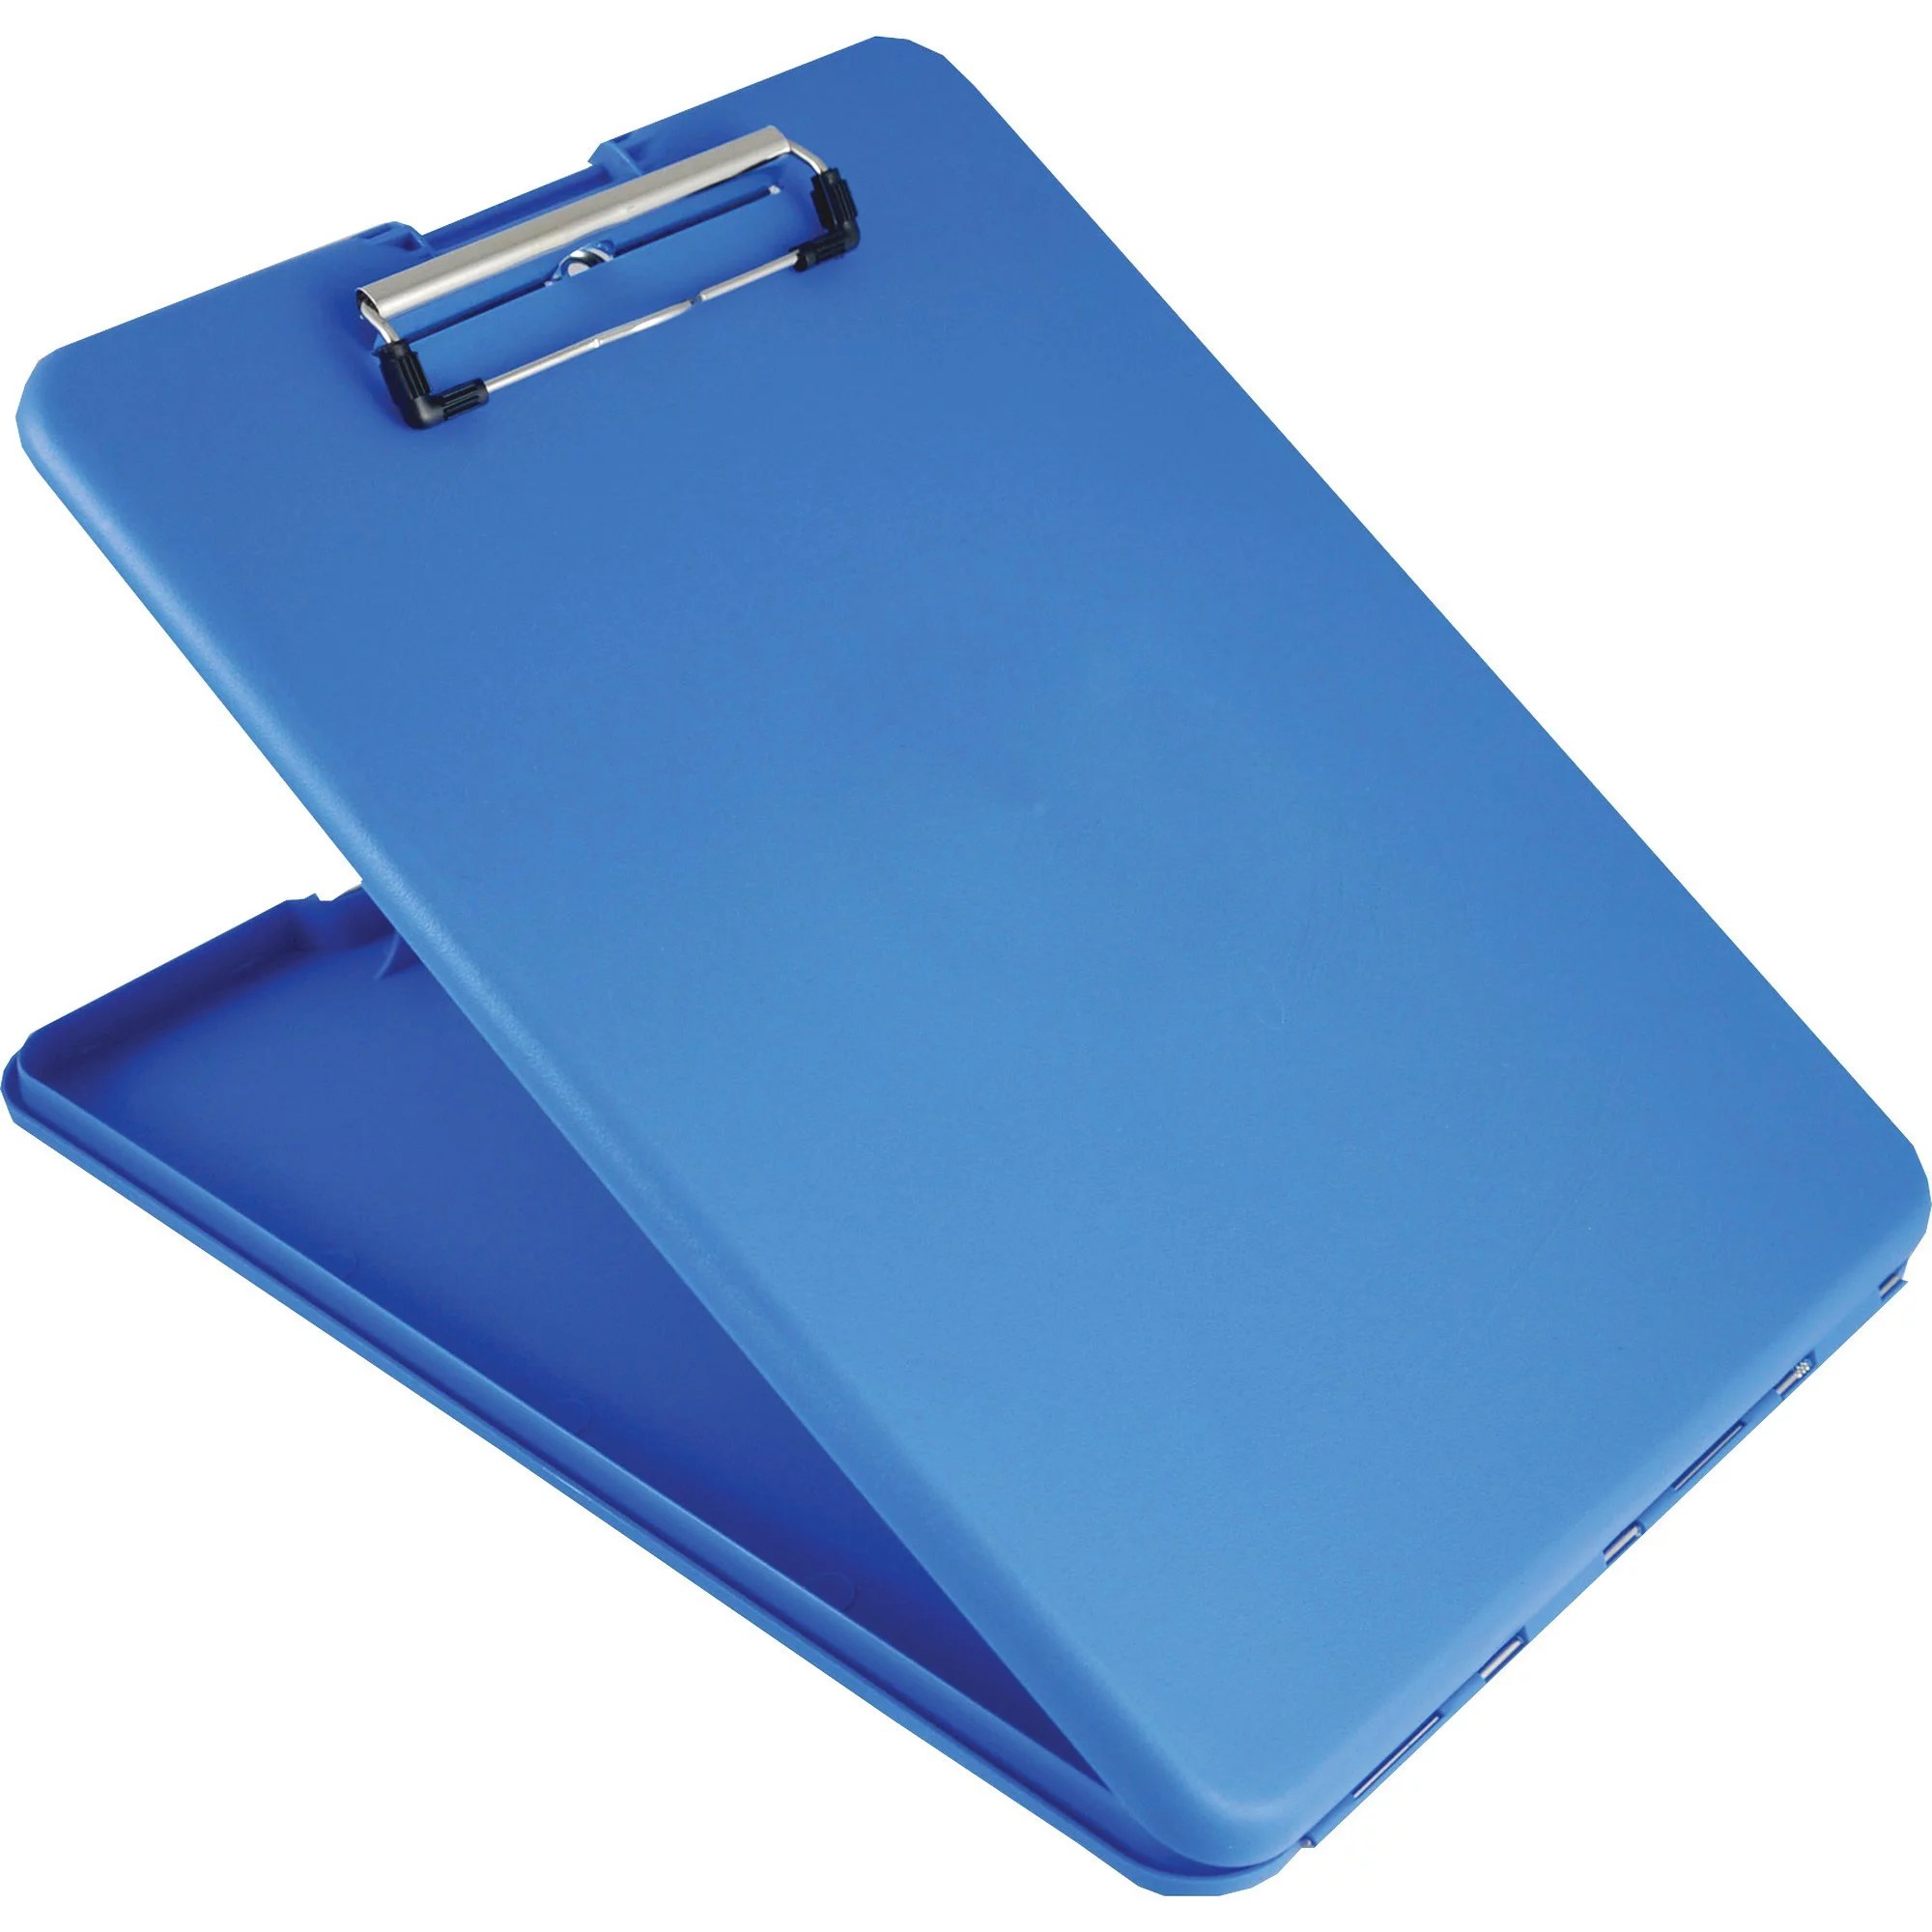 saunders sau00559 slimmate storage clipboard 1 each blue